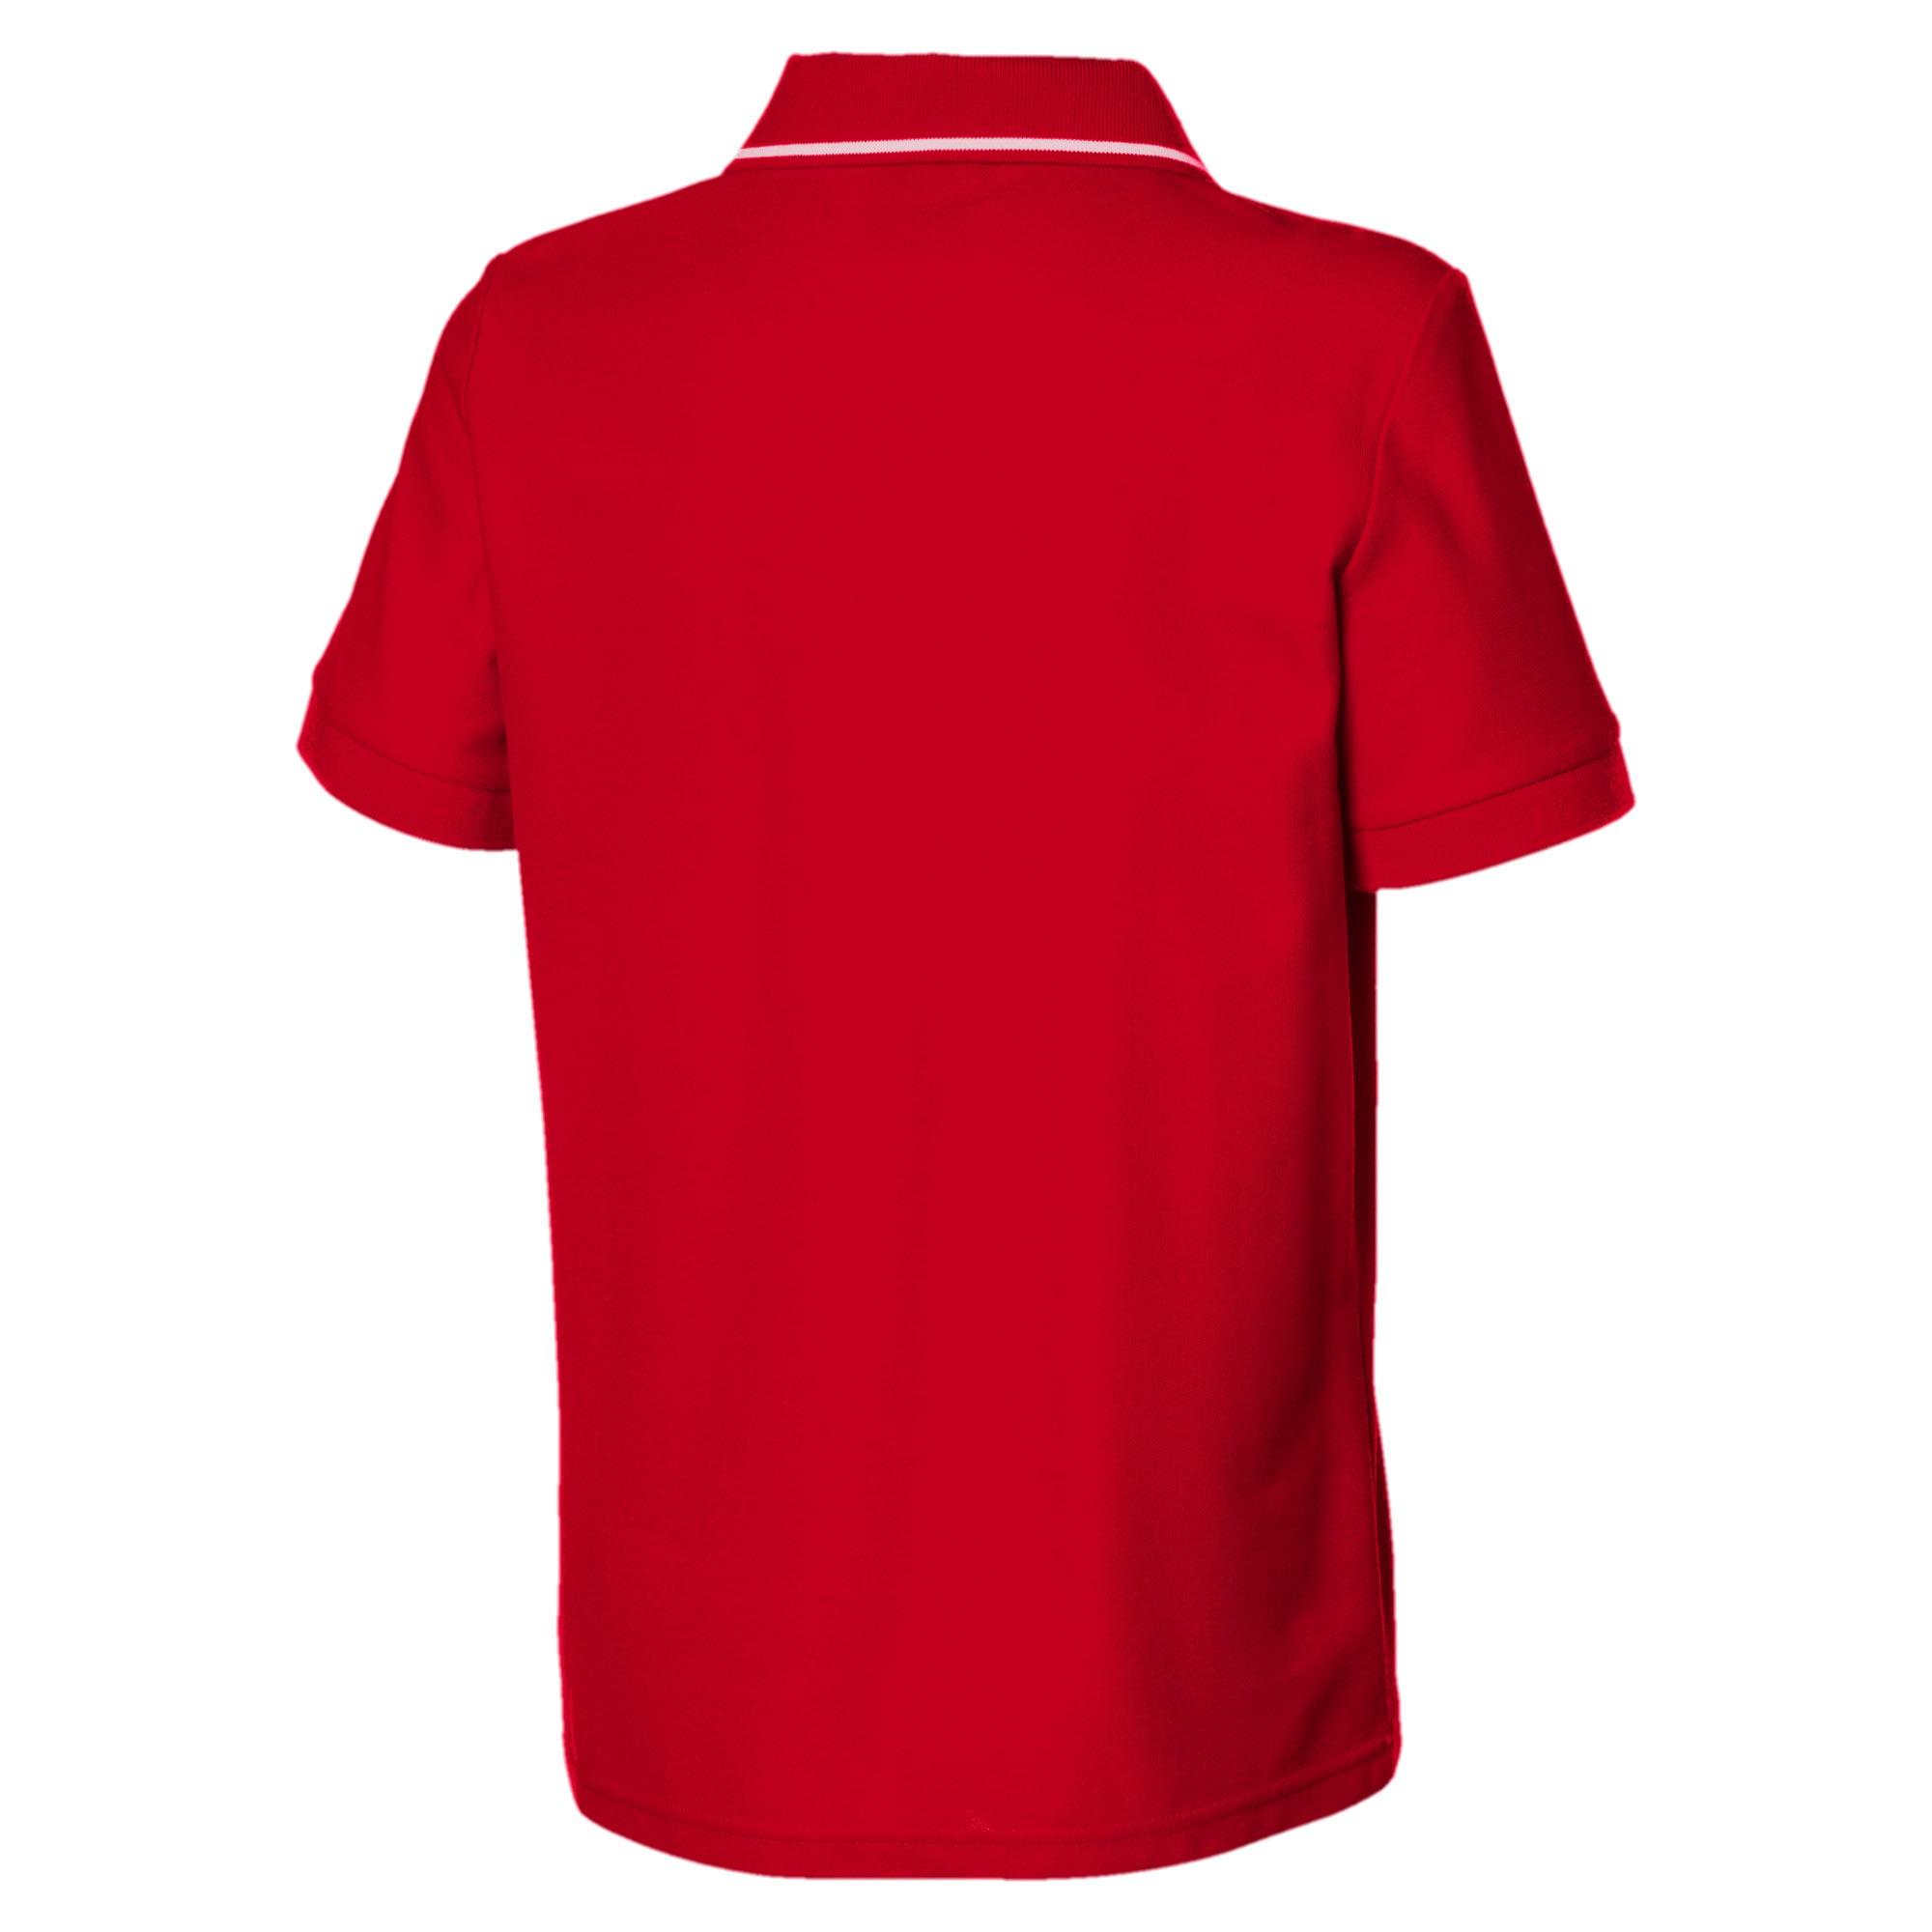 Thumbnail 2 of Ferrari Kids' Polo Shirt, Rosso Corsa, medium